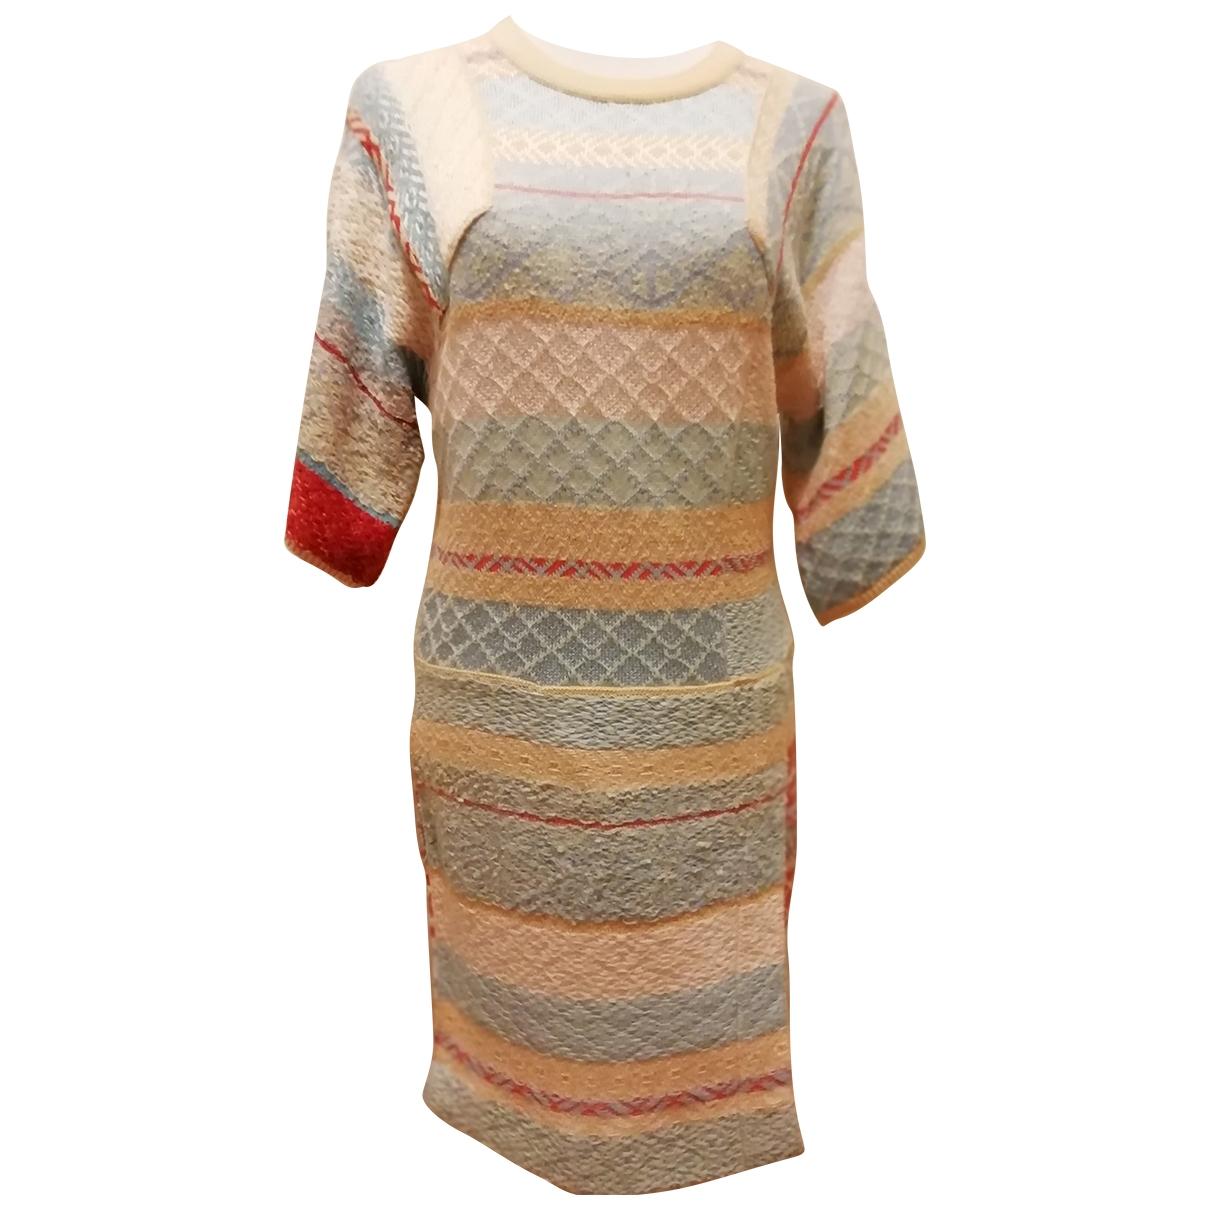 Sonia Rykiel \N Multicolour dress for Women 38 FR